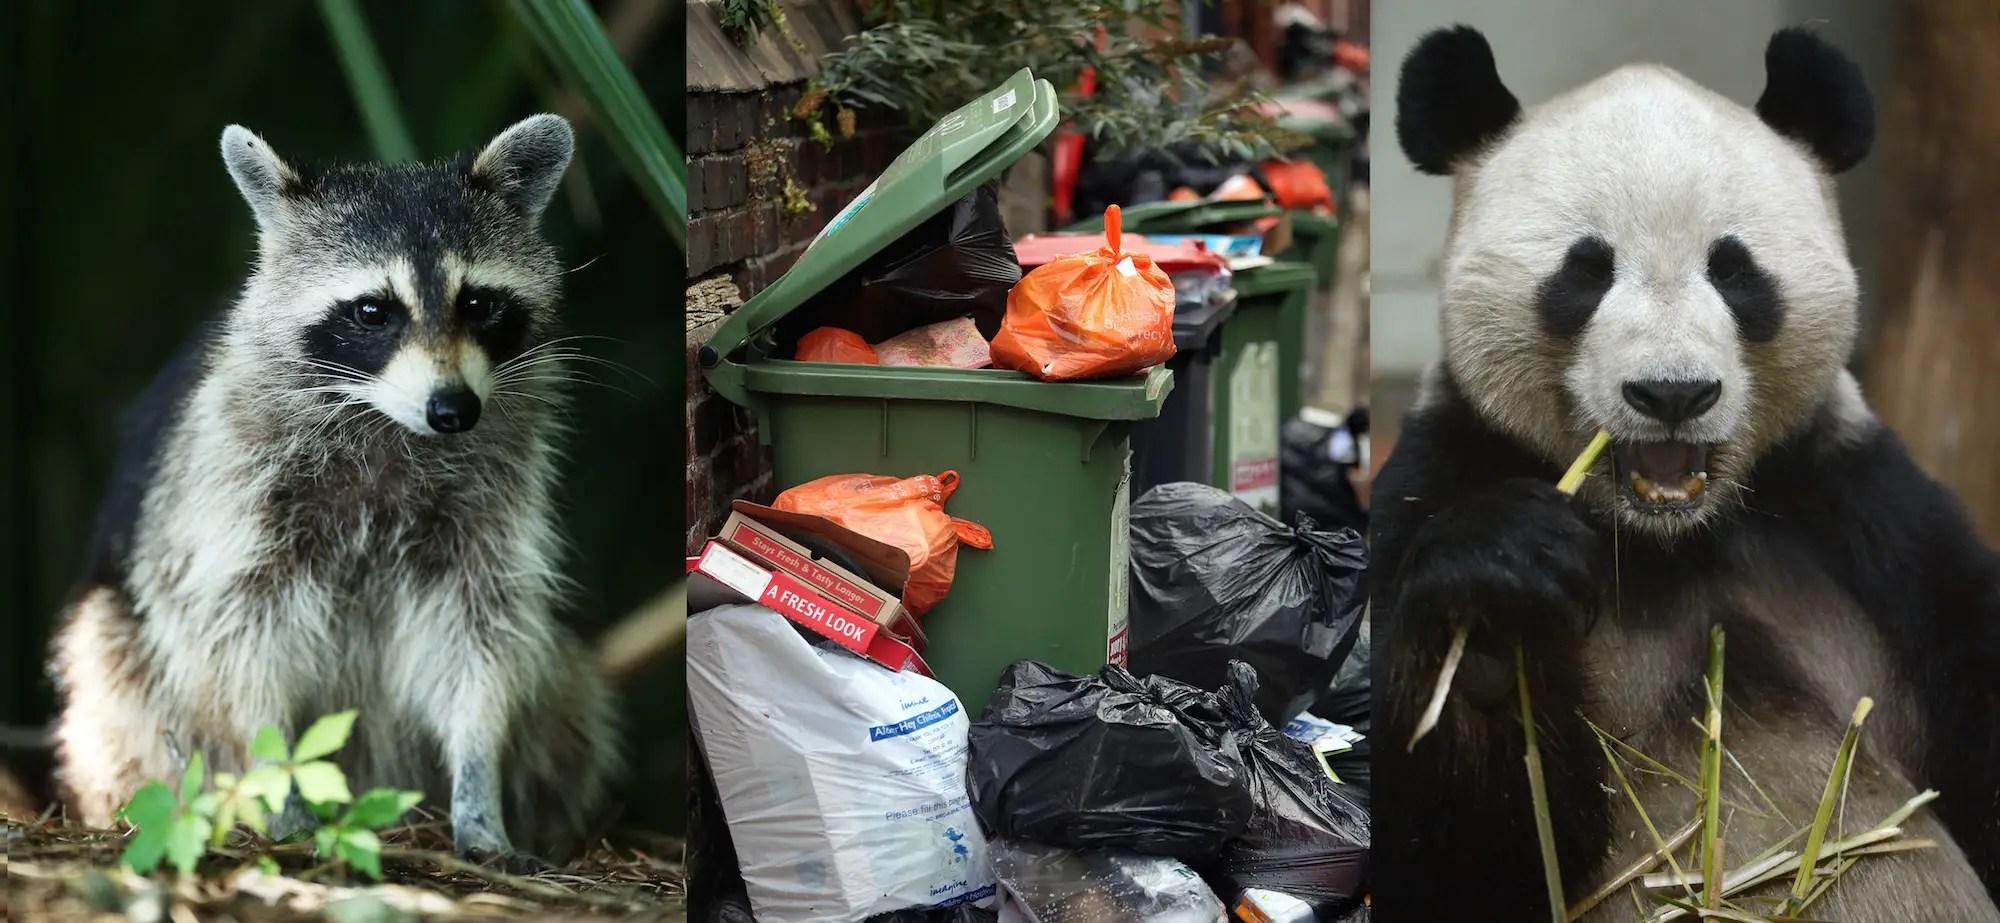 Trash Panda Raccoon Meme Explained Insider